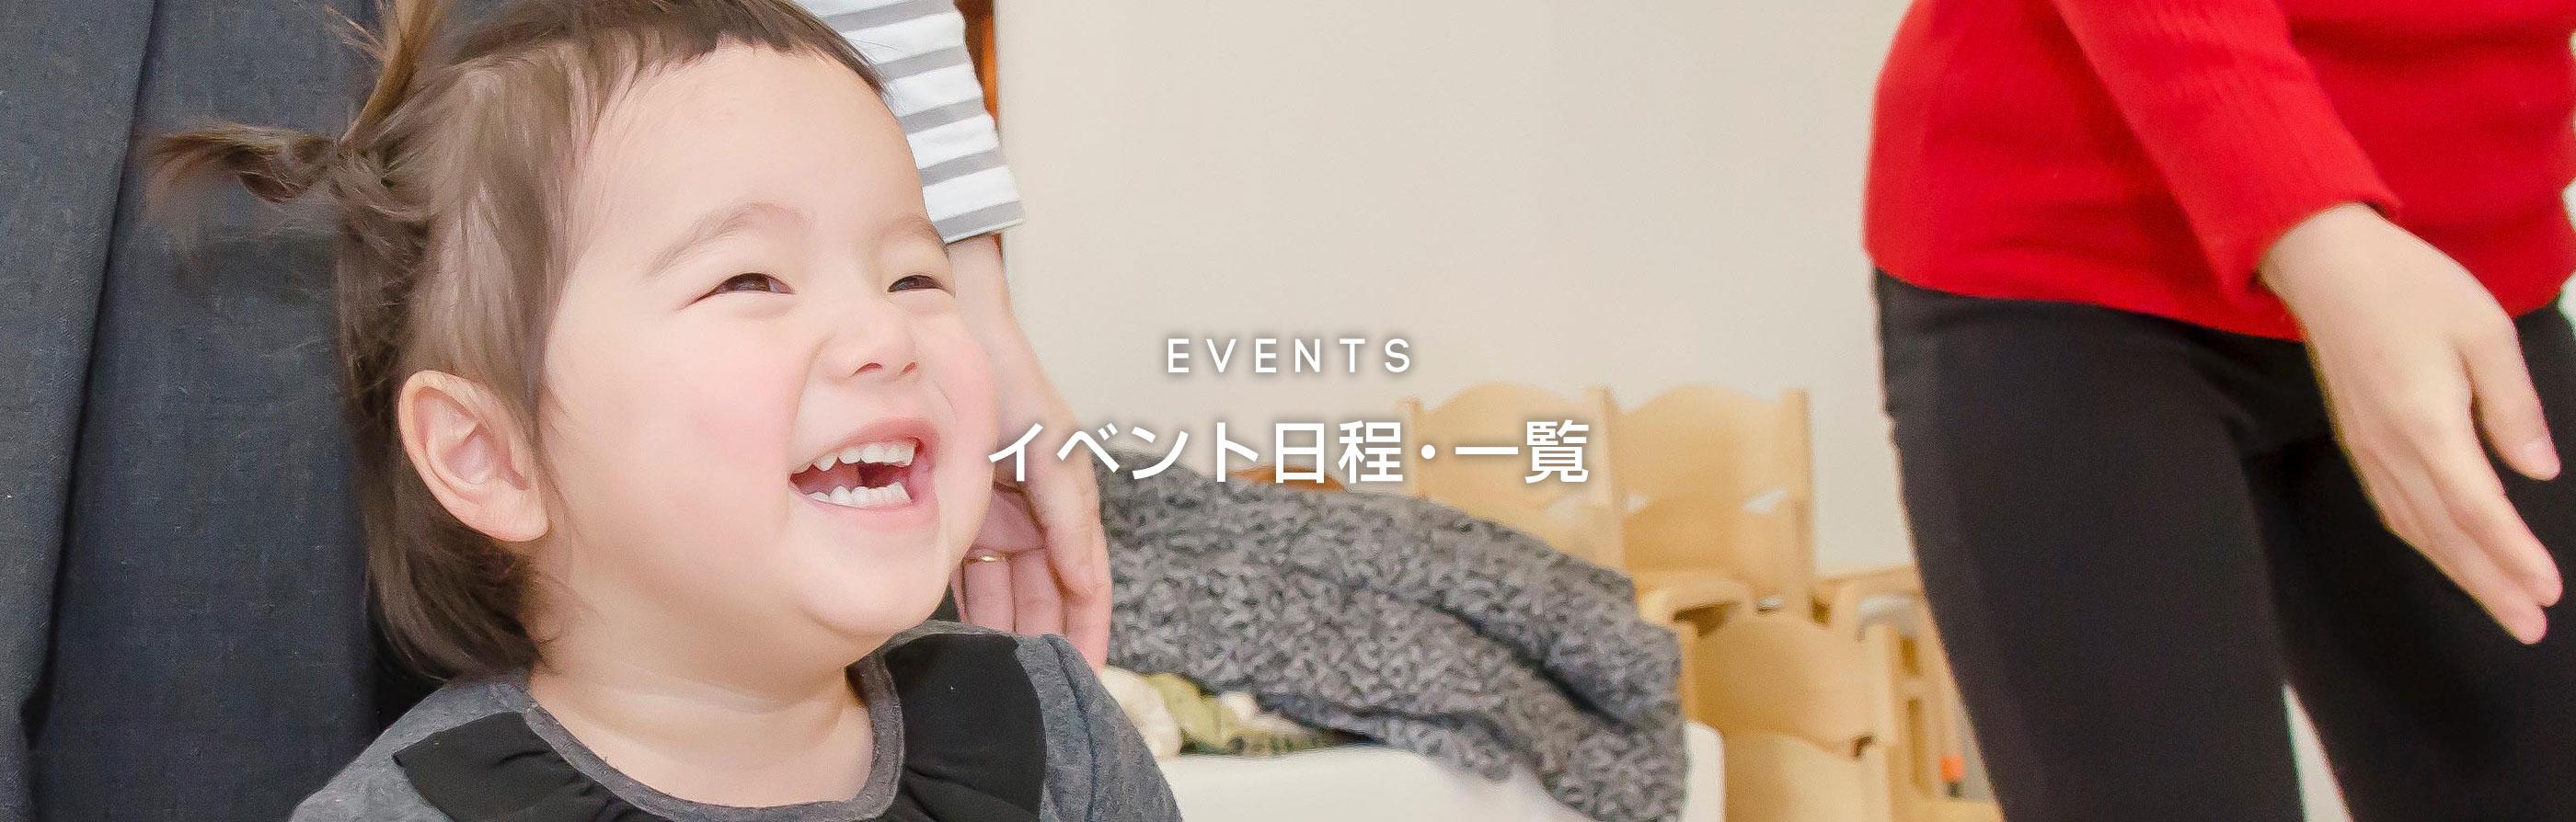 mama-event-slider